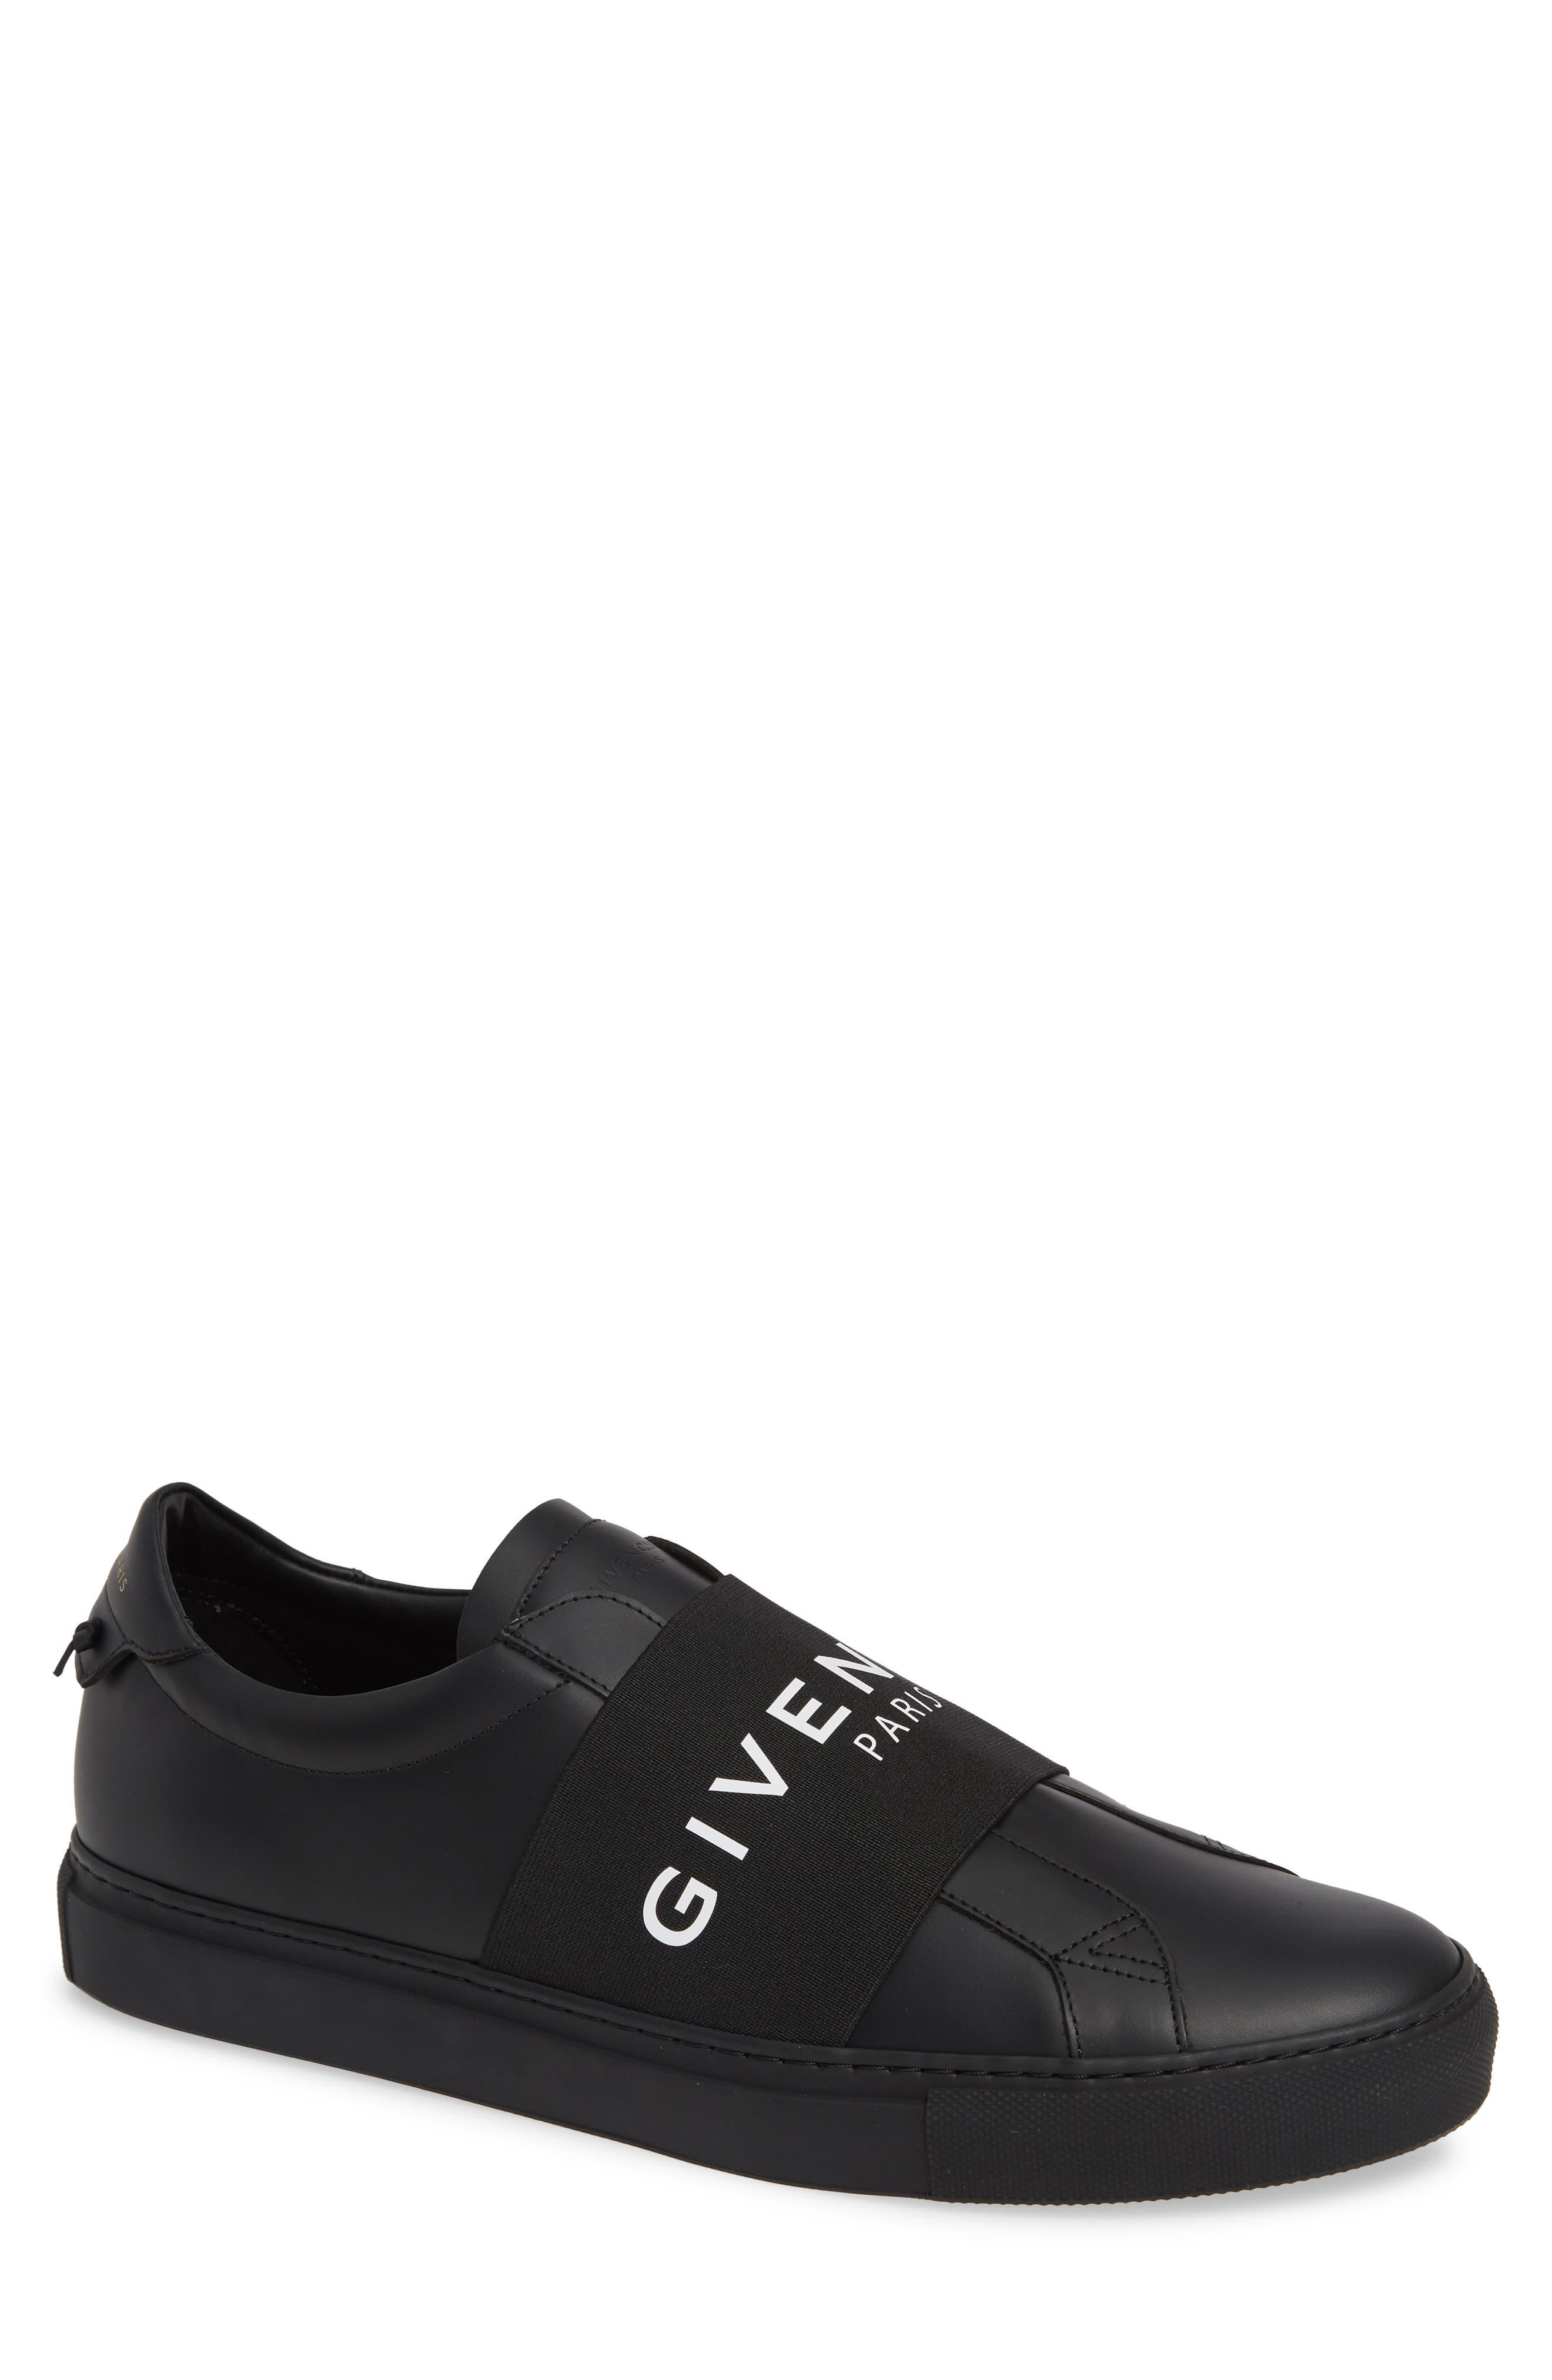 Urban Knots Sneaker,                         Main,                         color, 001